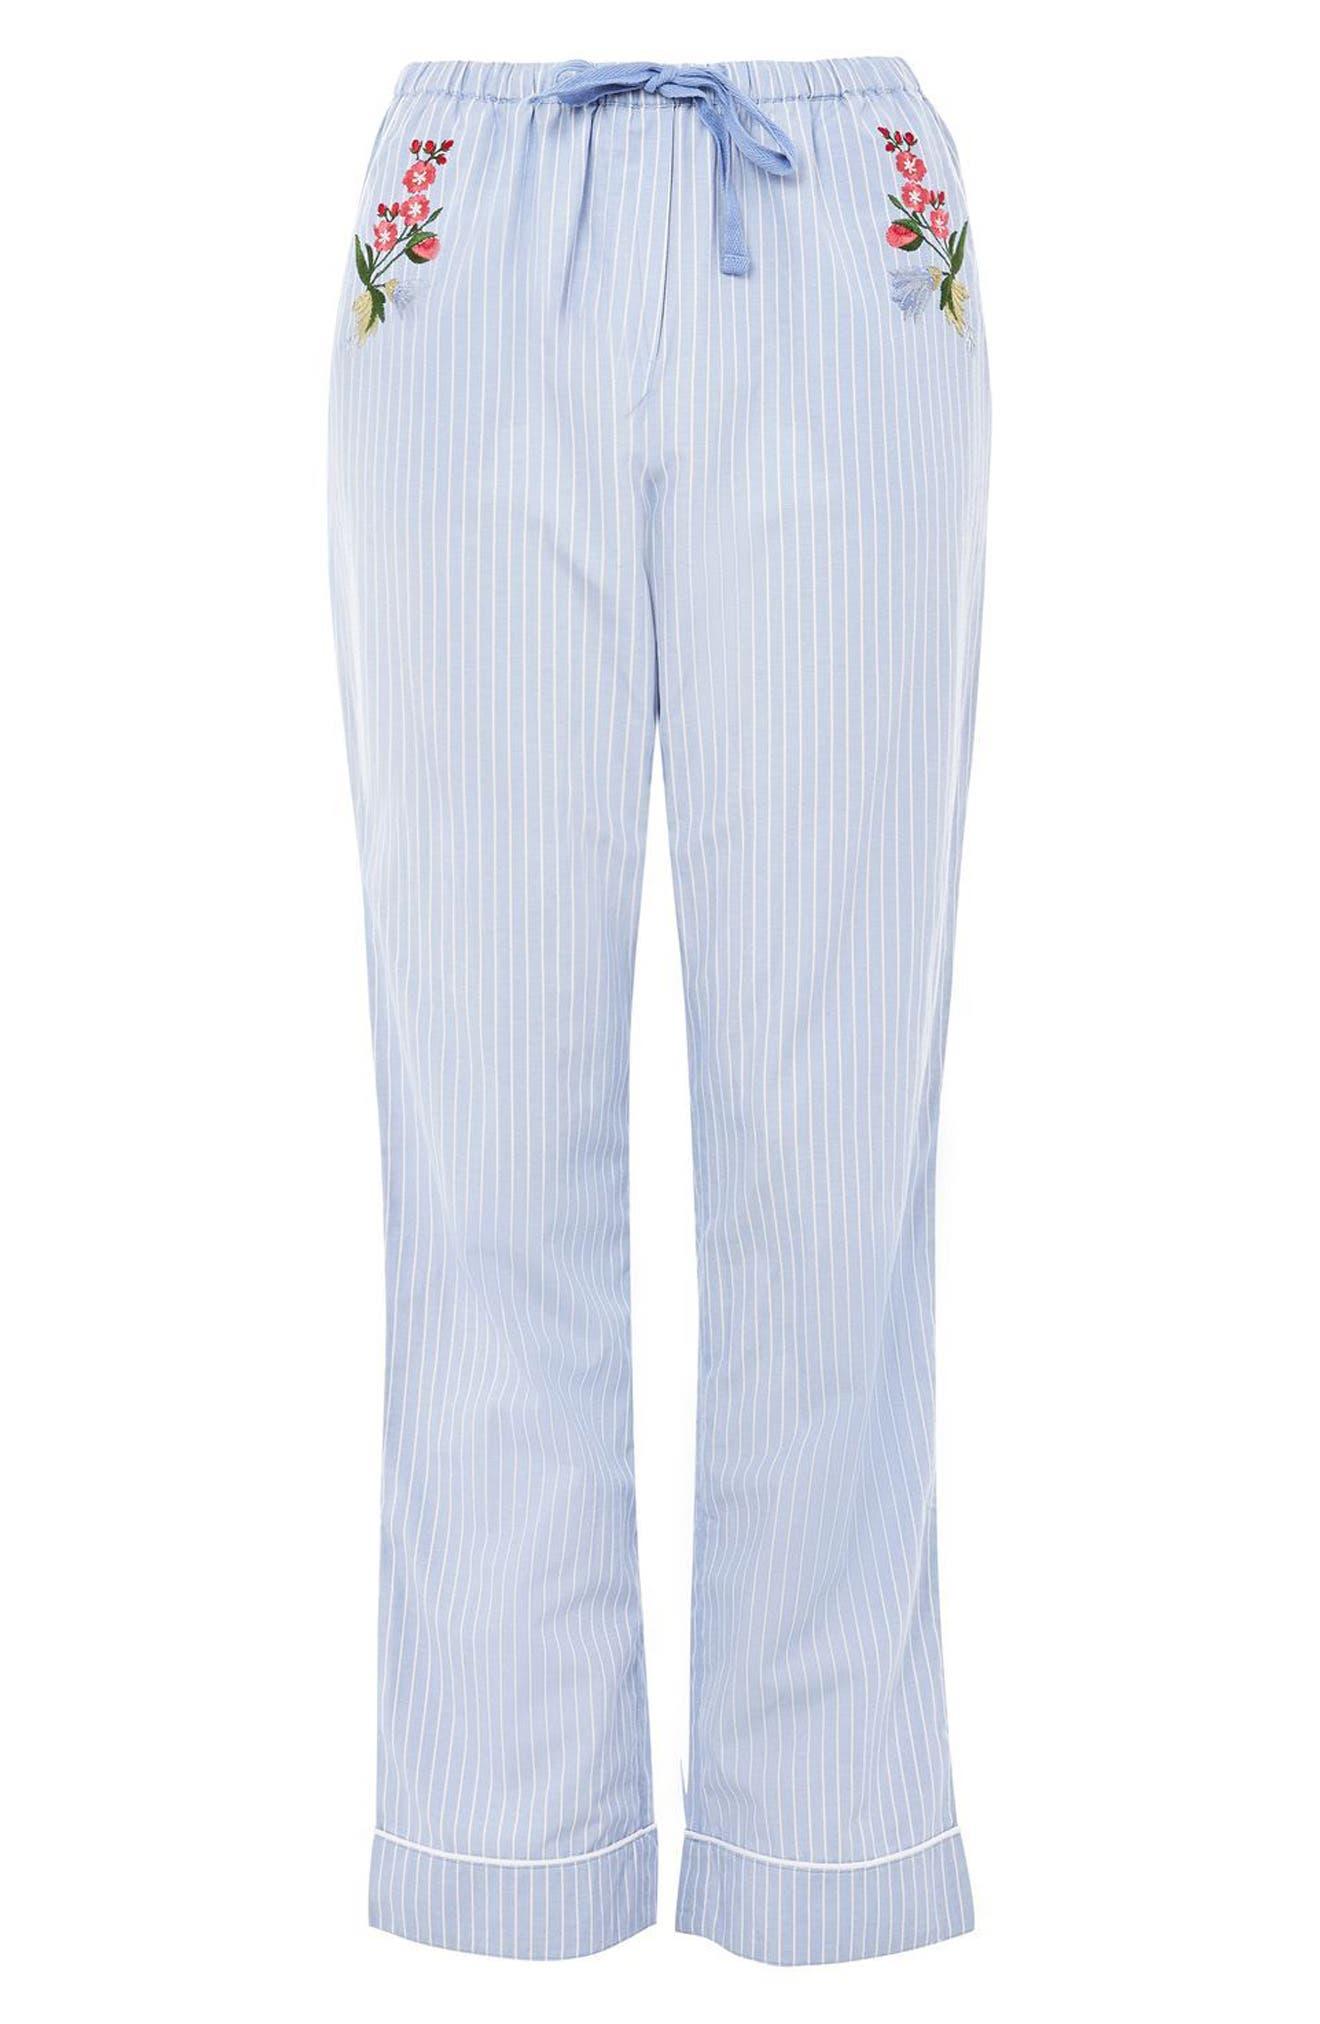 Floral Embroidered Stripe Pajama Pants,                             Alternate thumbnail 3, color,                             Blue Multi